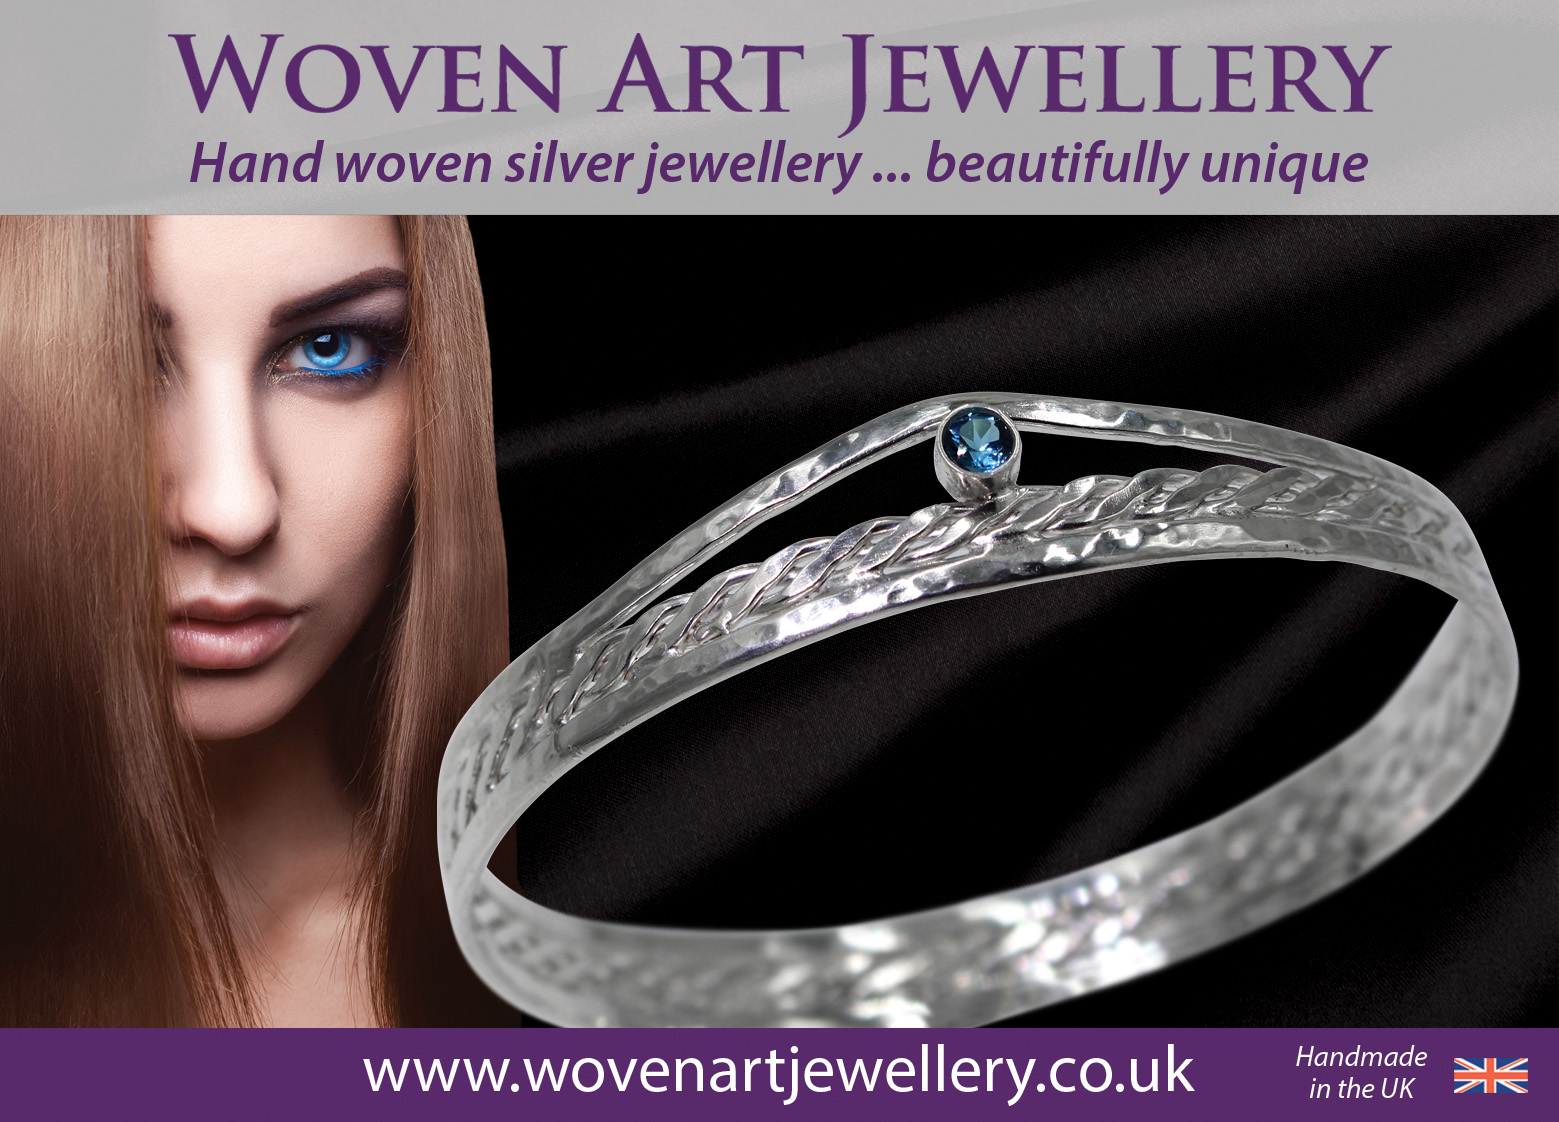 Woven Art Jewellery advert 2